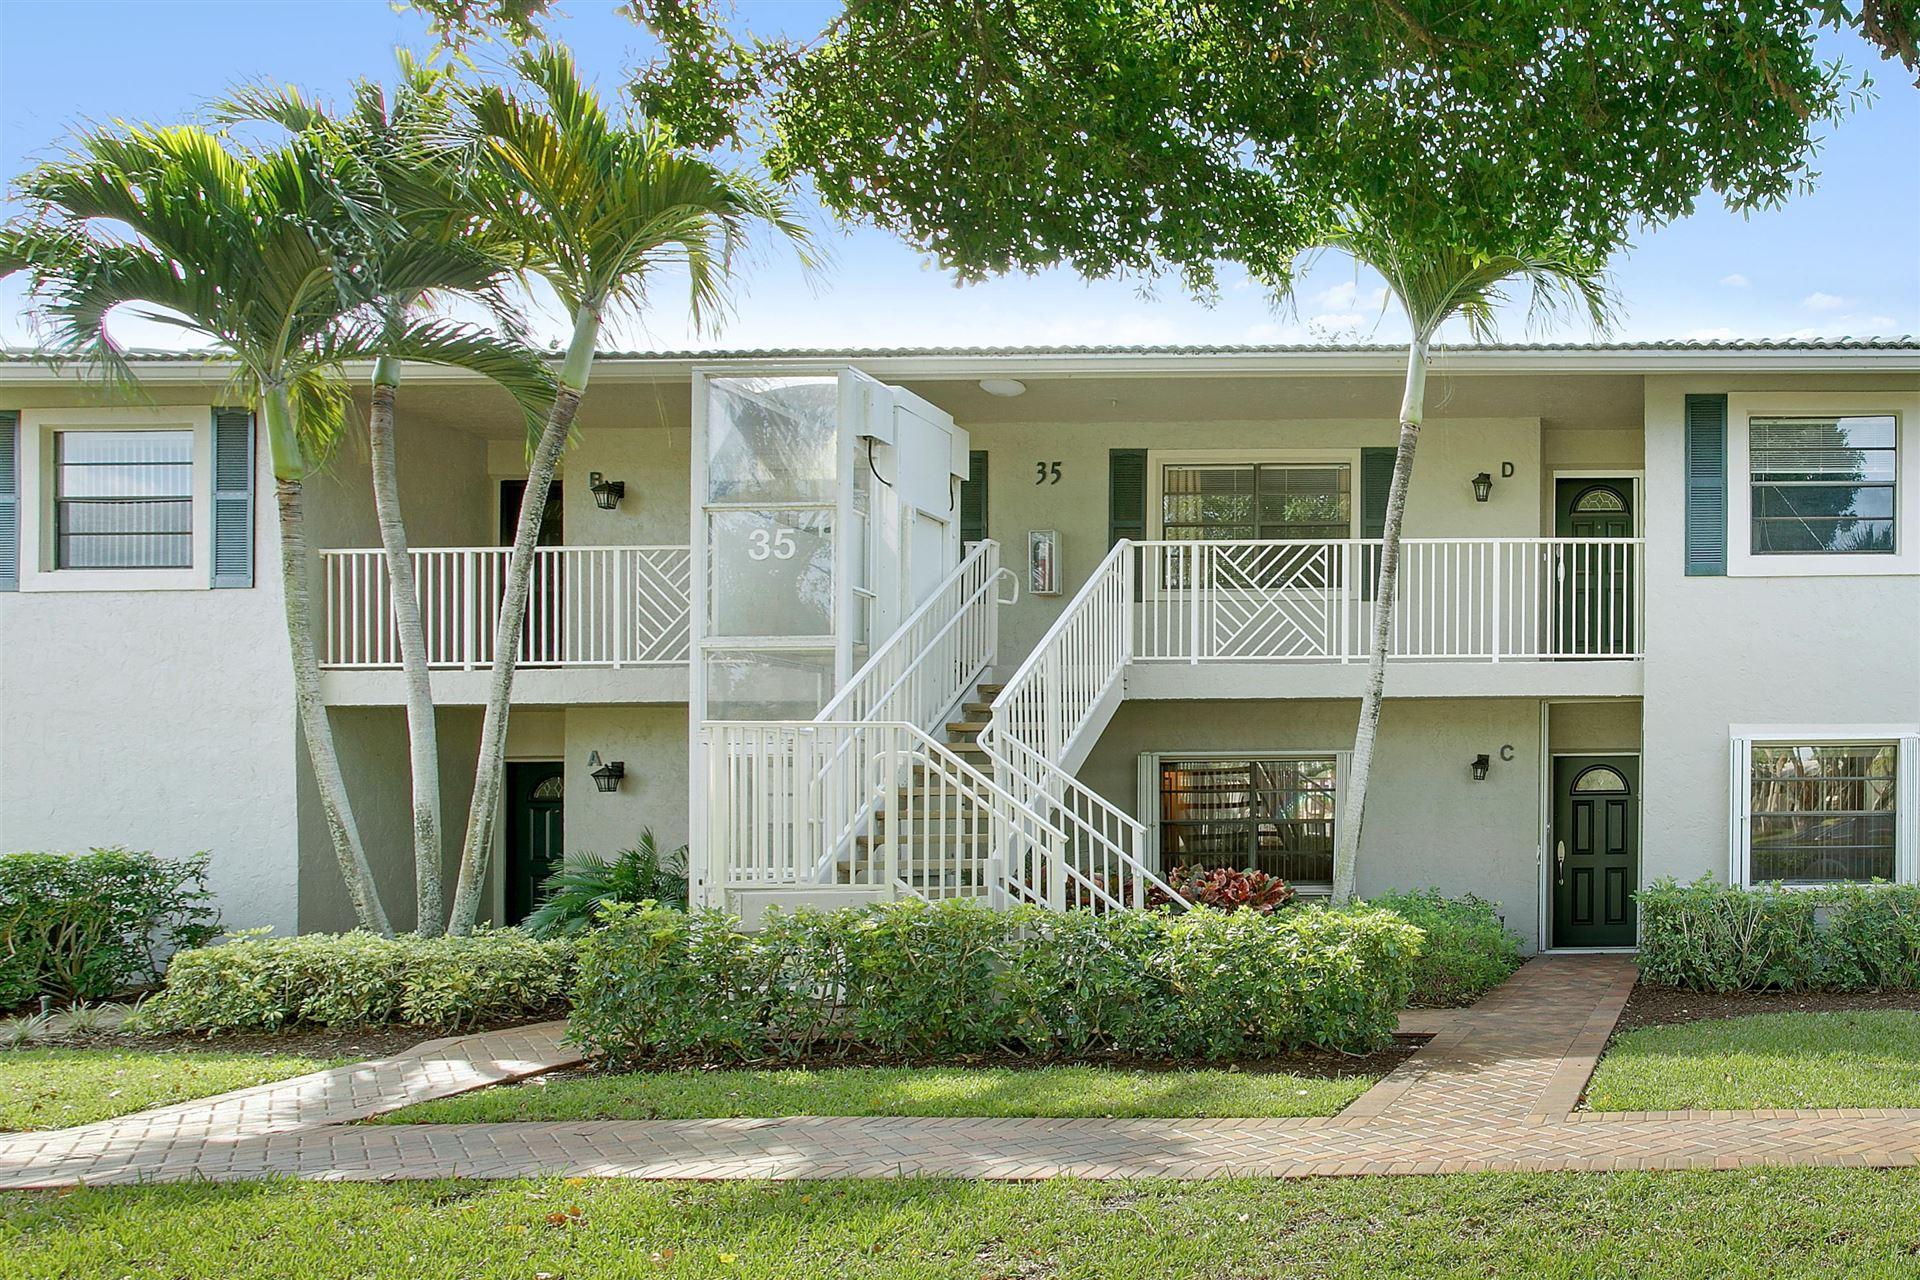 35 W Stratford Lane #C, Boynton Beach, FL 33436 - MLS#: RX-10710773